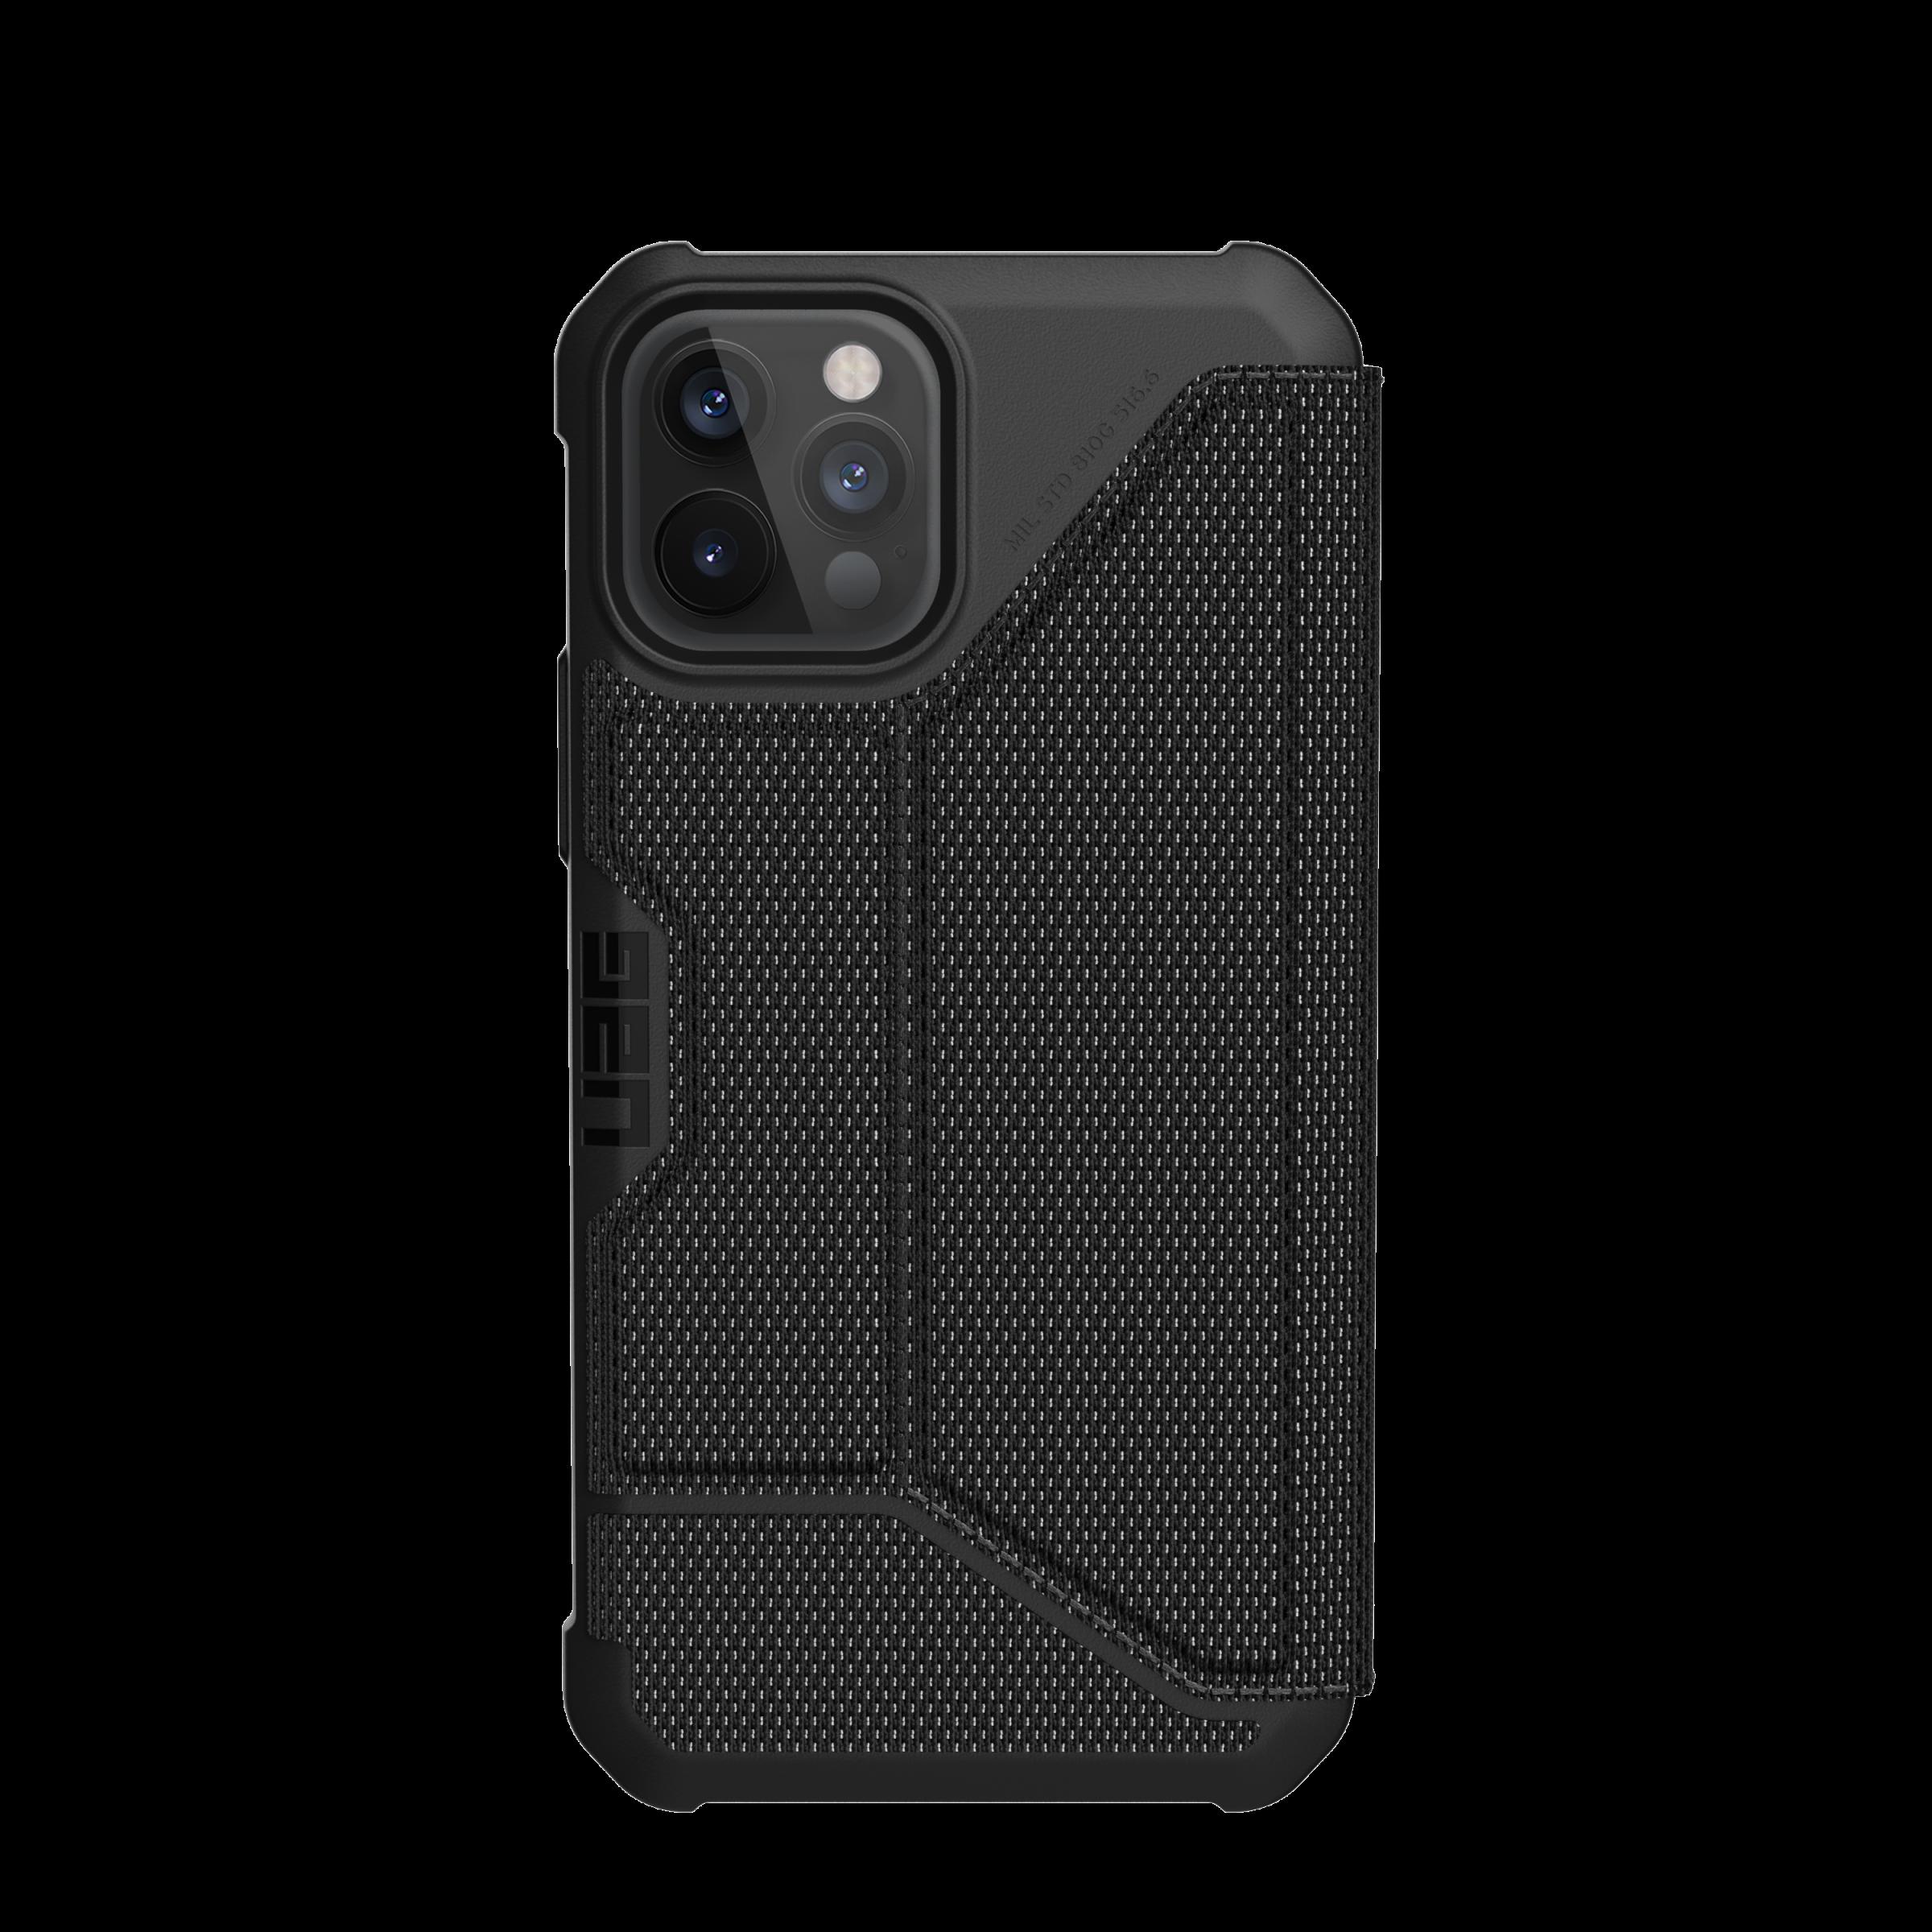 Metropolis Wallet Case iPhone 12 Pro Max Kevlar Black